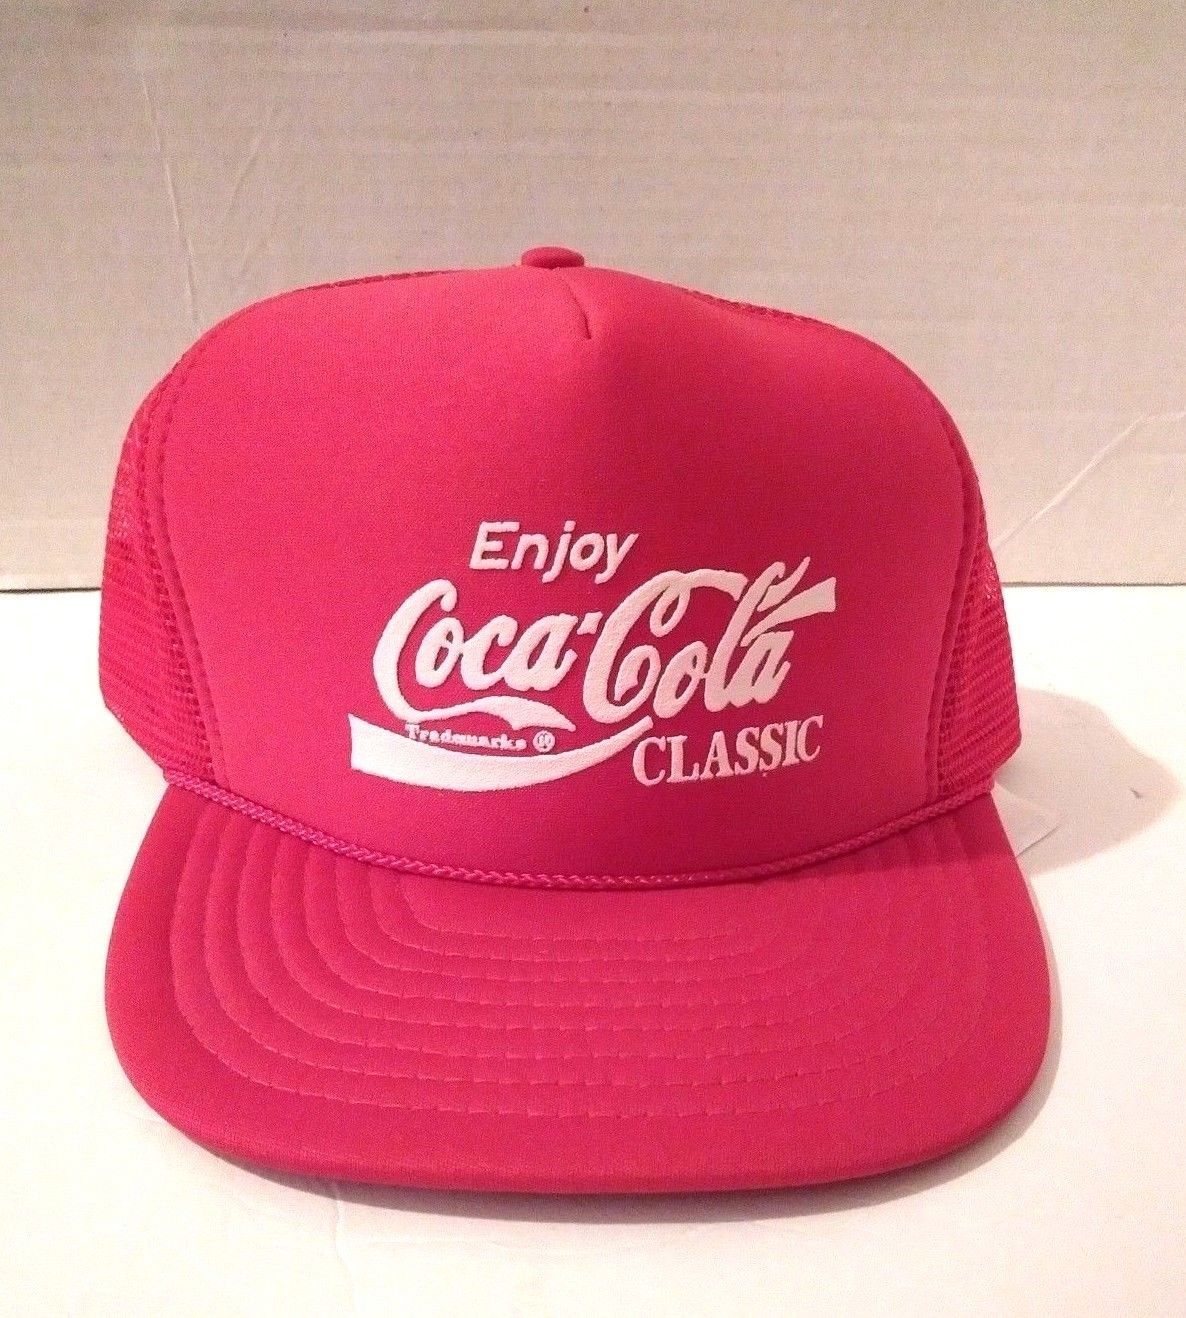 Vintage Enjoy Coca-Cola Classic Snapback Trucker Mesh Foam Cap Hat Red Nissun